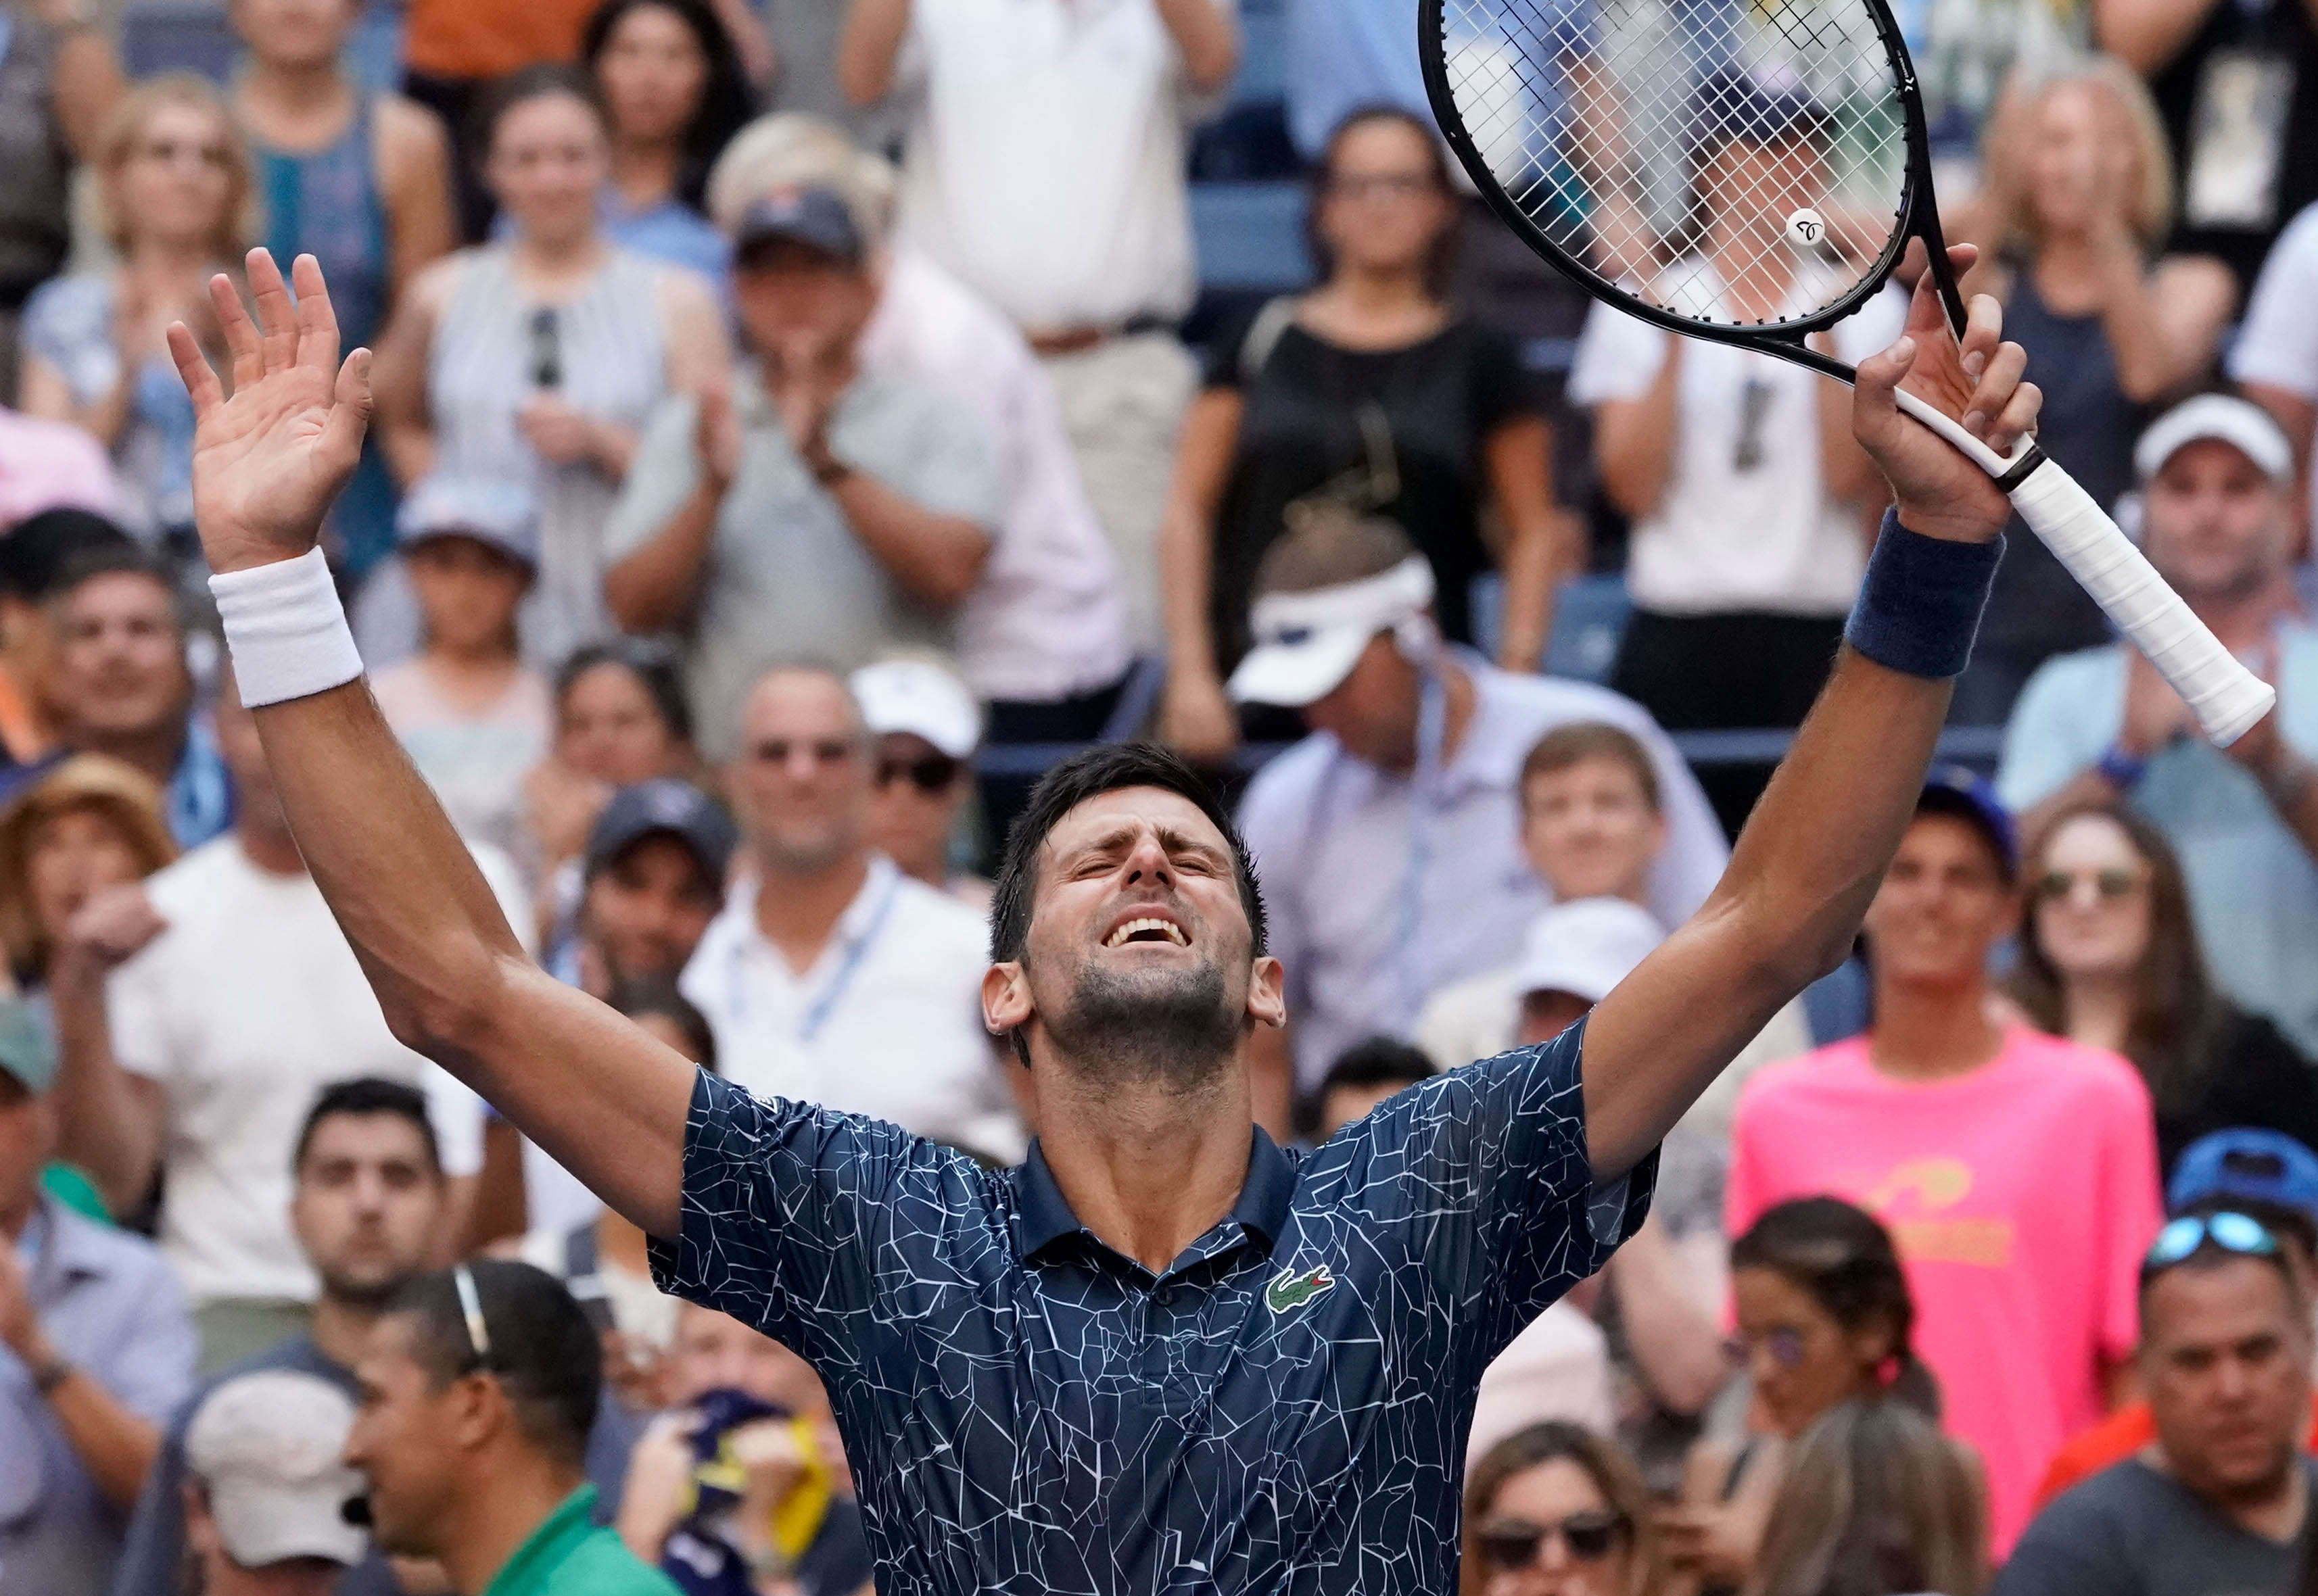 Tennis: Djokovic beats heat and Sousa to reach quarters